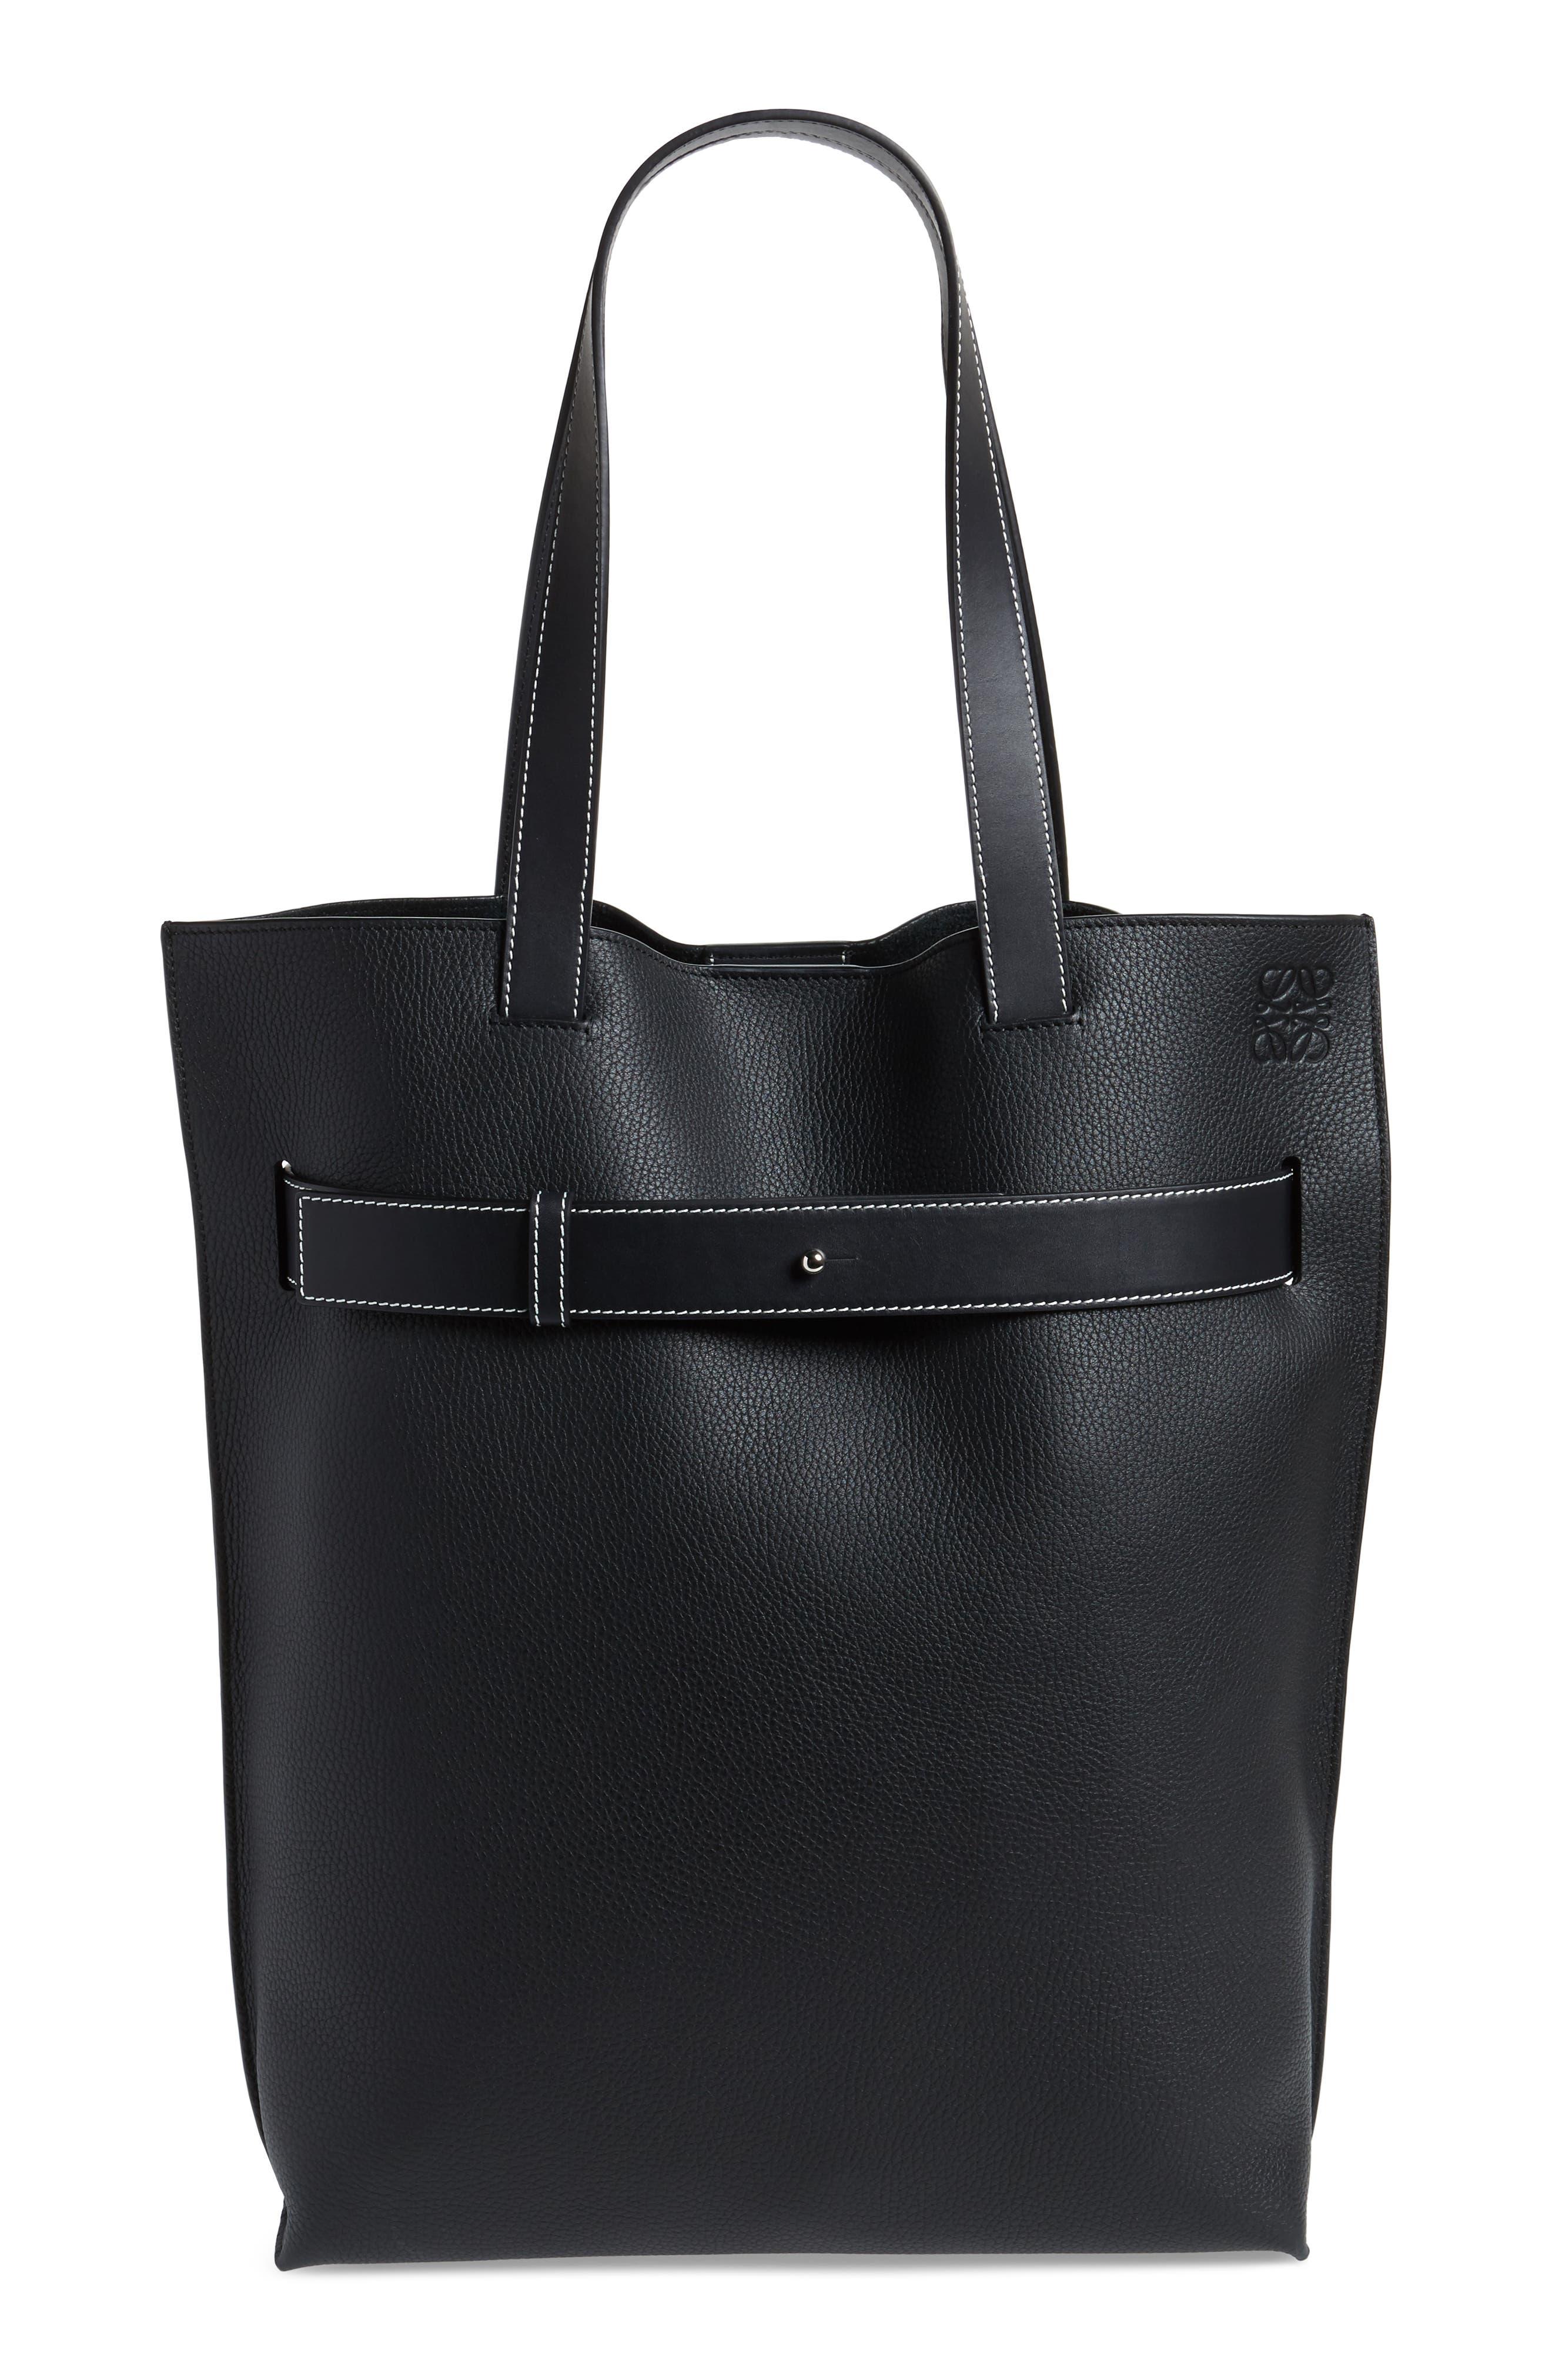 Main Image - Loewe Leather Tote Bag